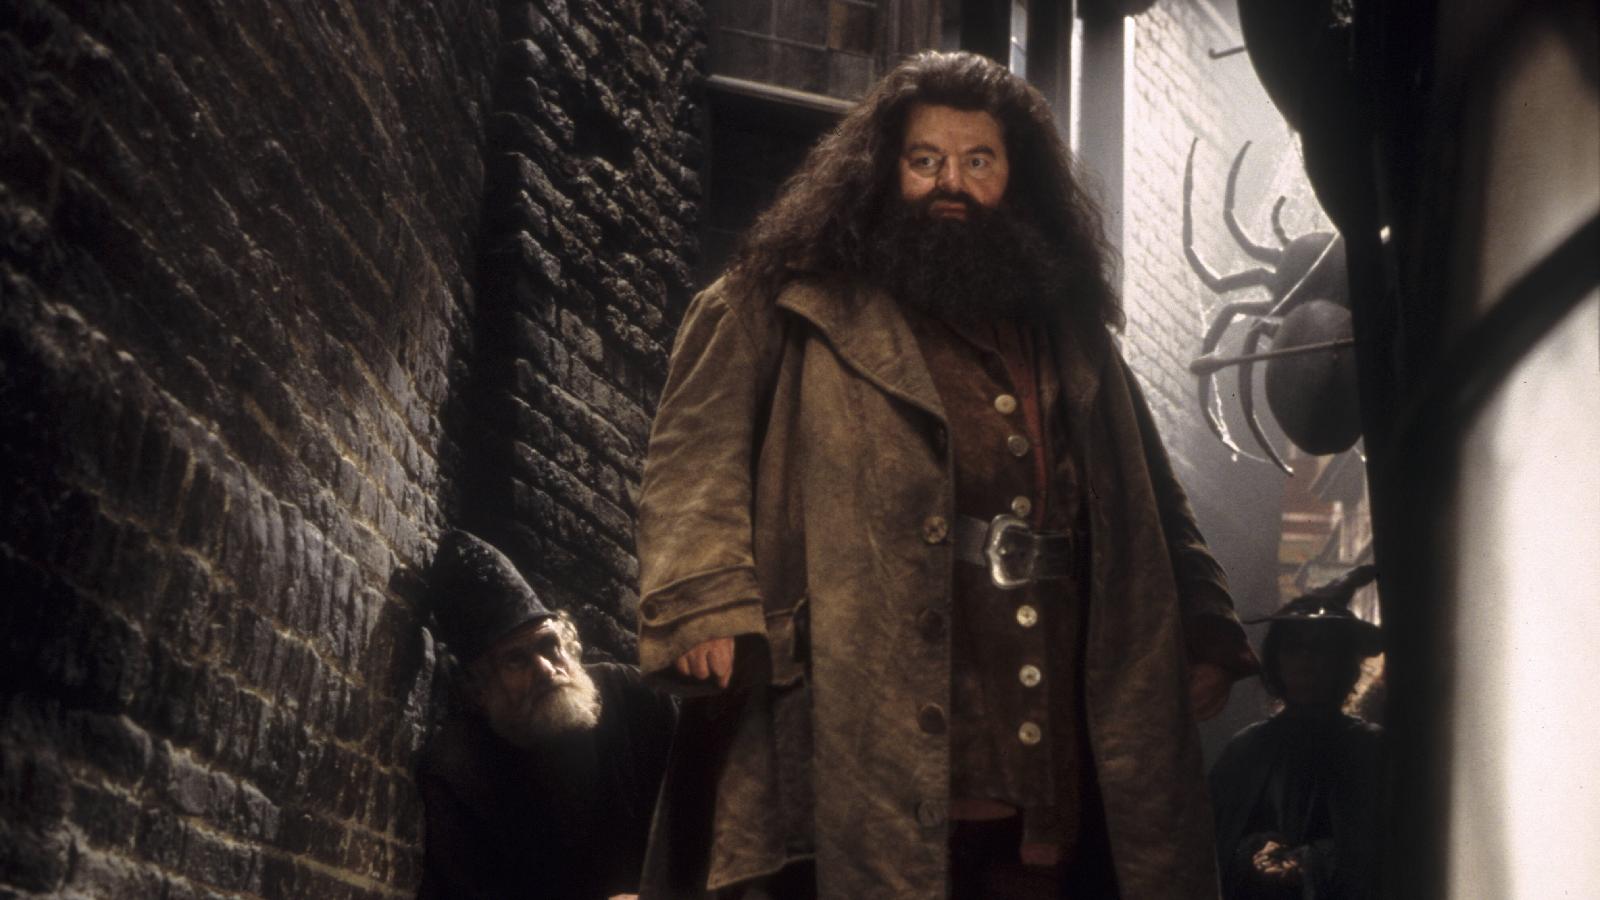 So geht es Robbie Coltrane alias Hagrid heute